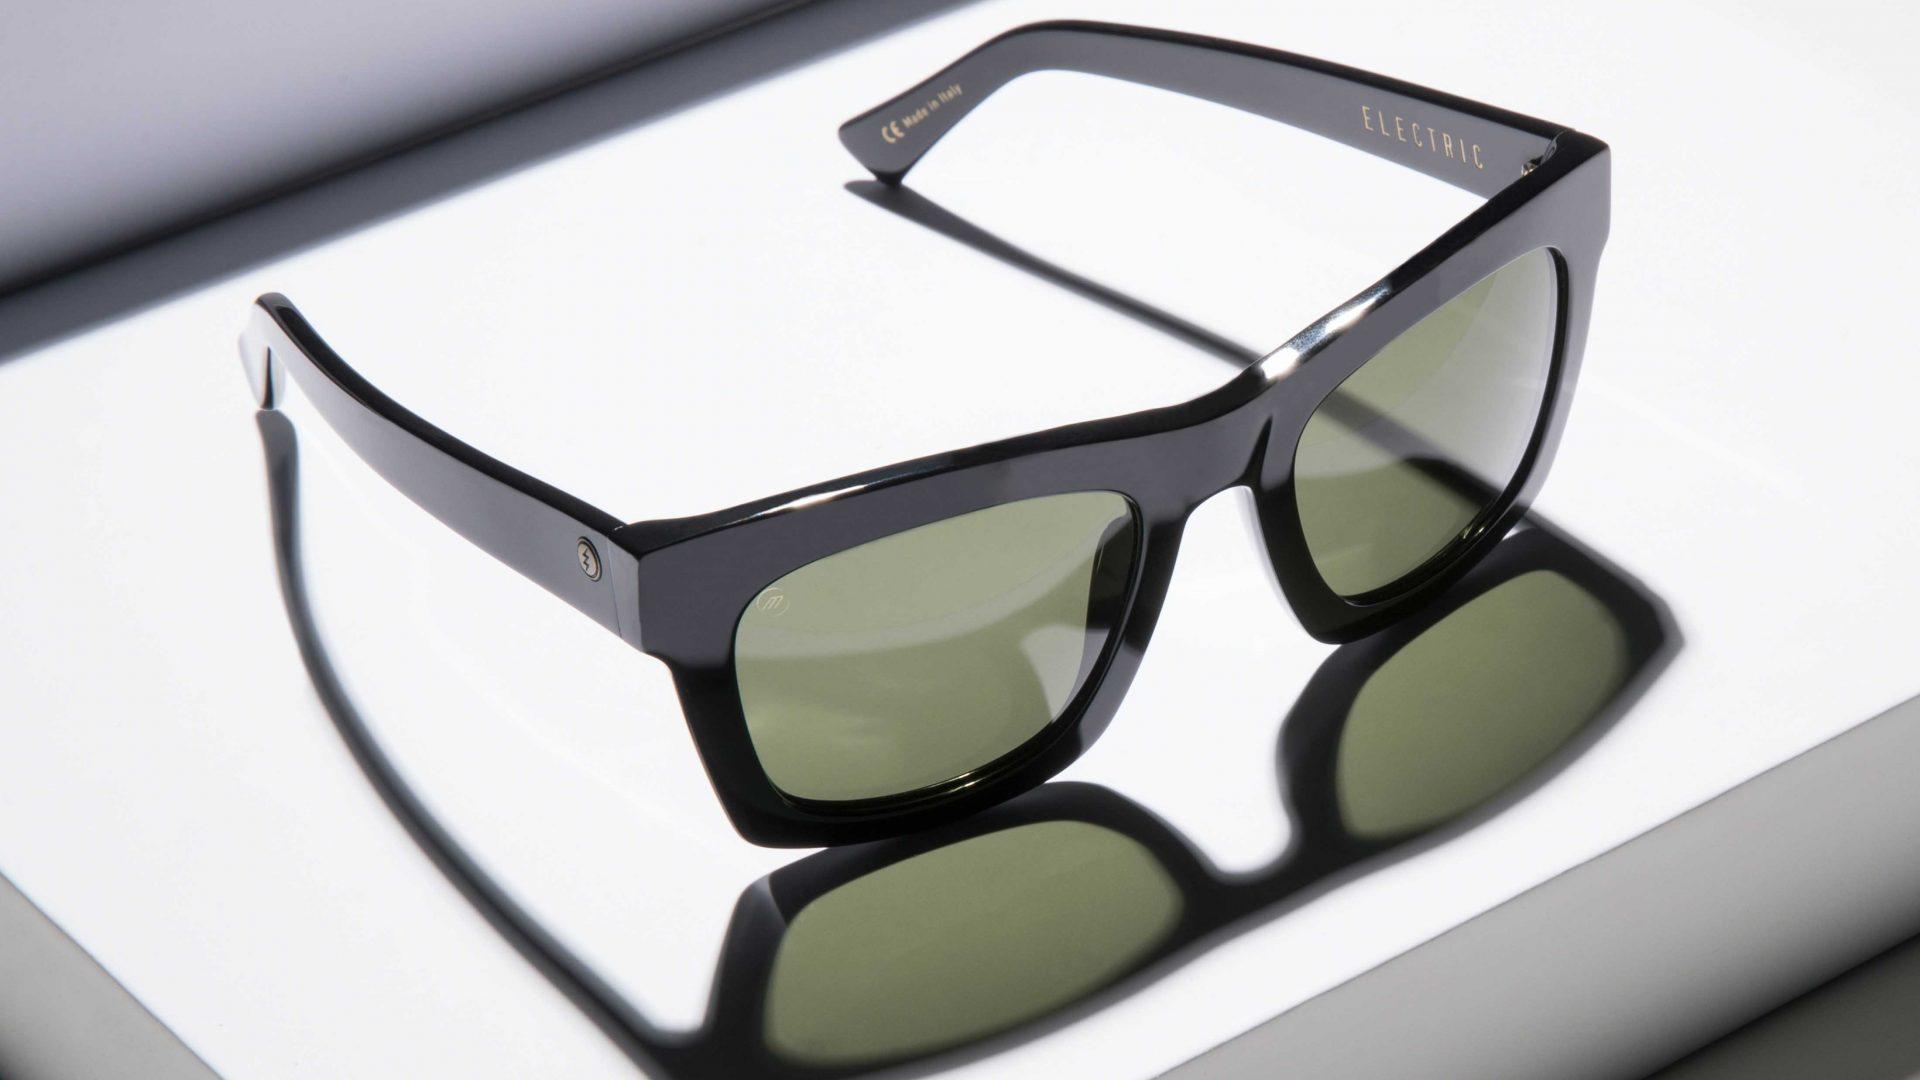 Electric SS21 Sunglasses